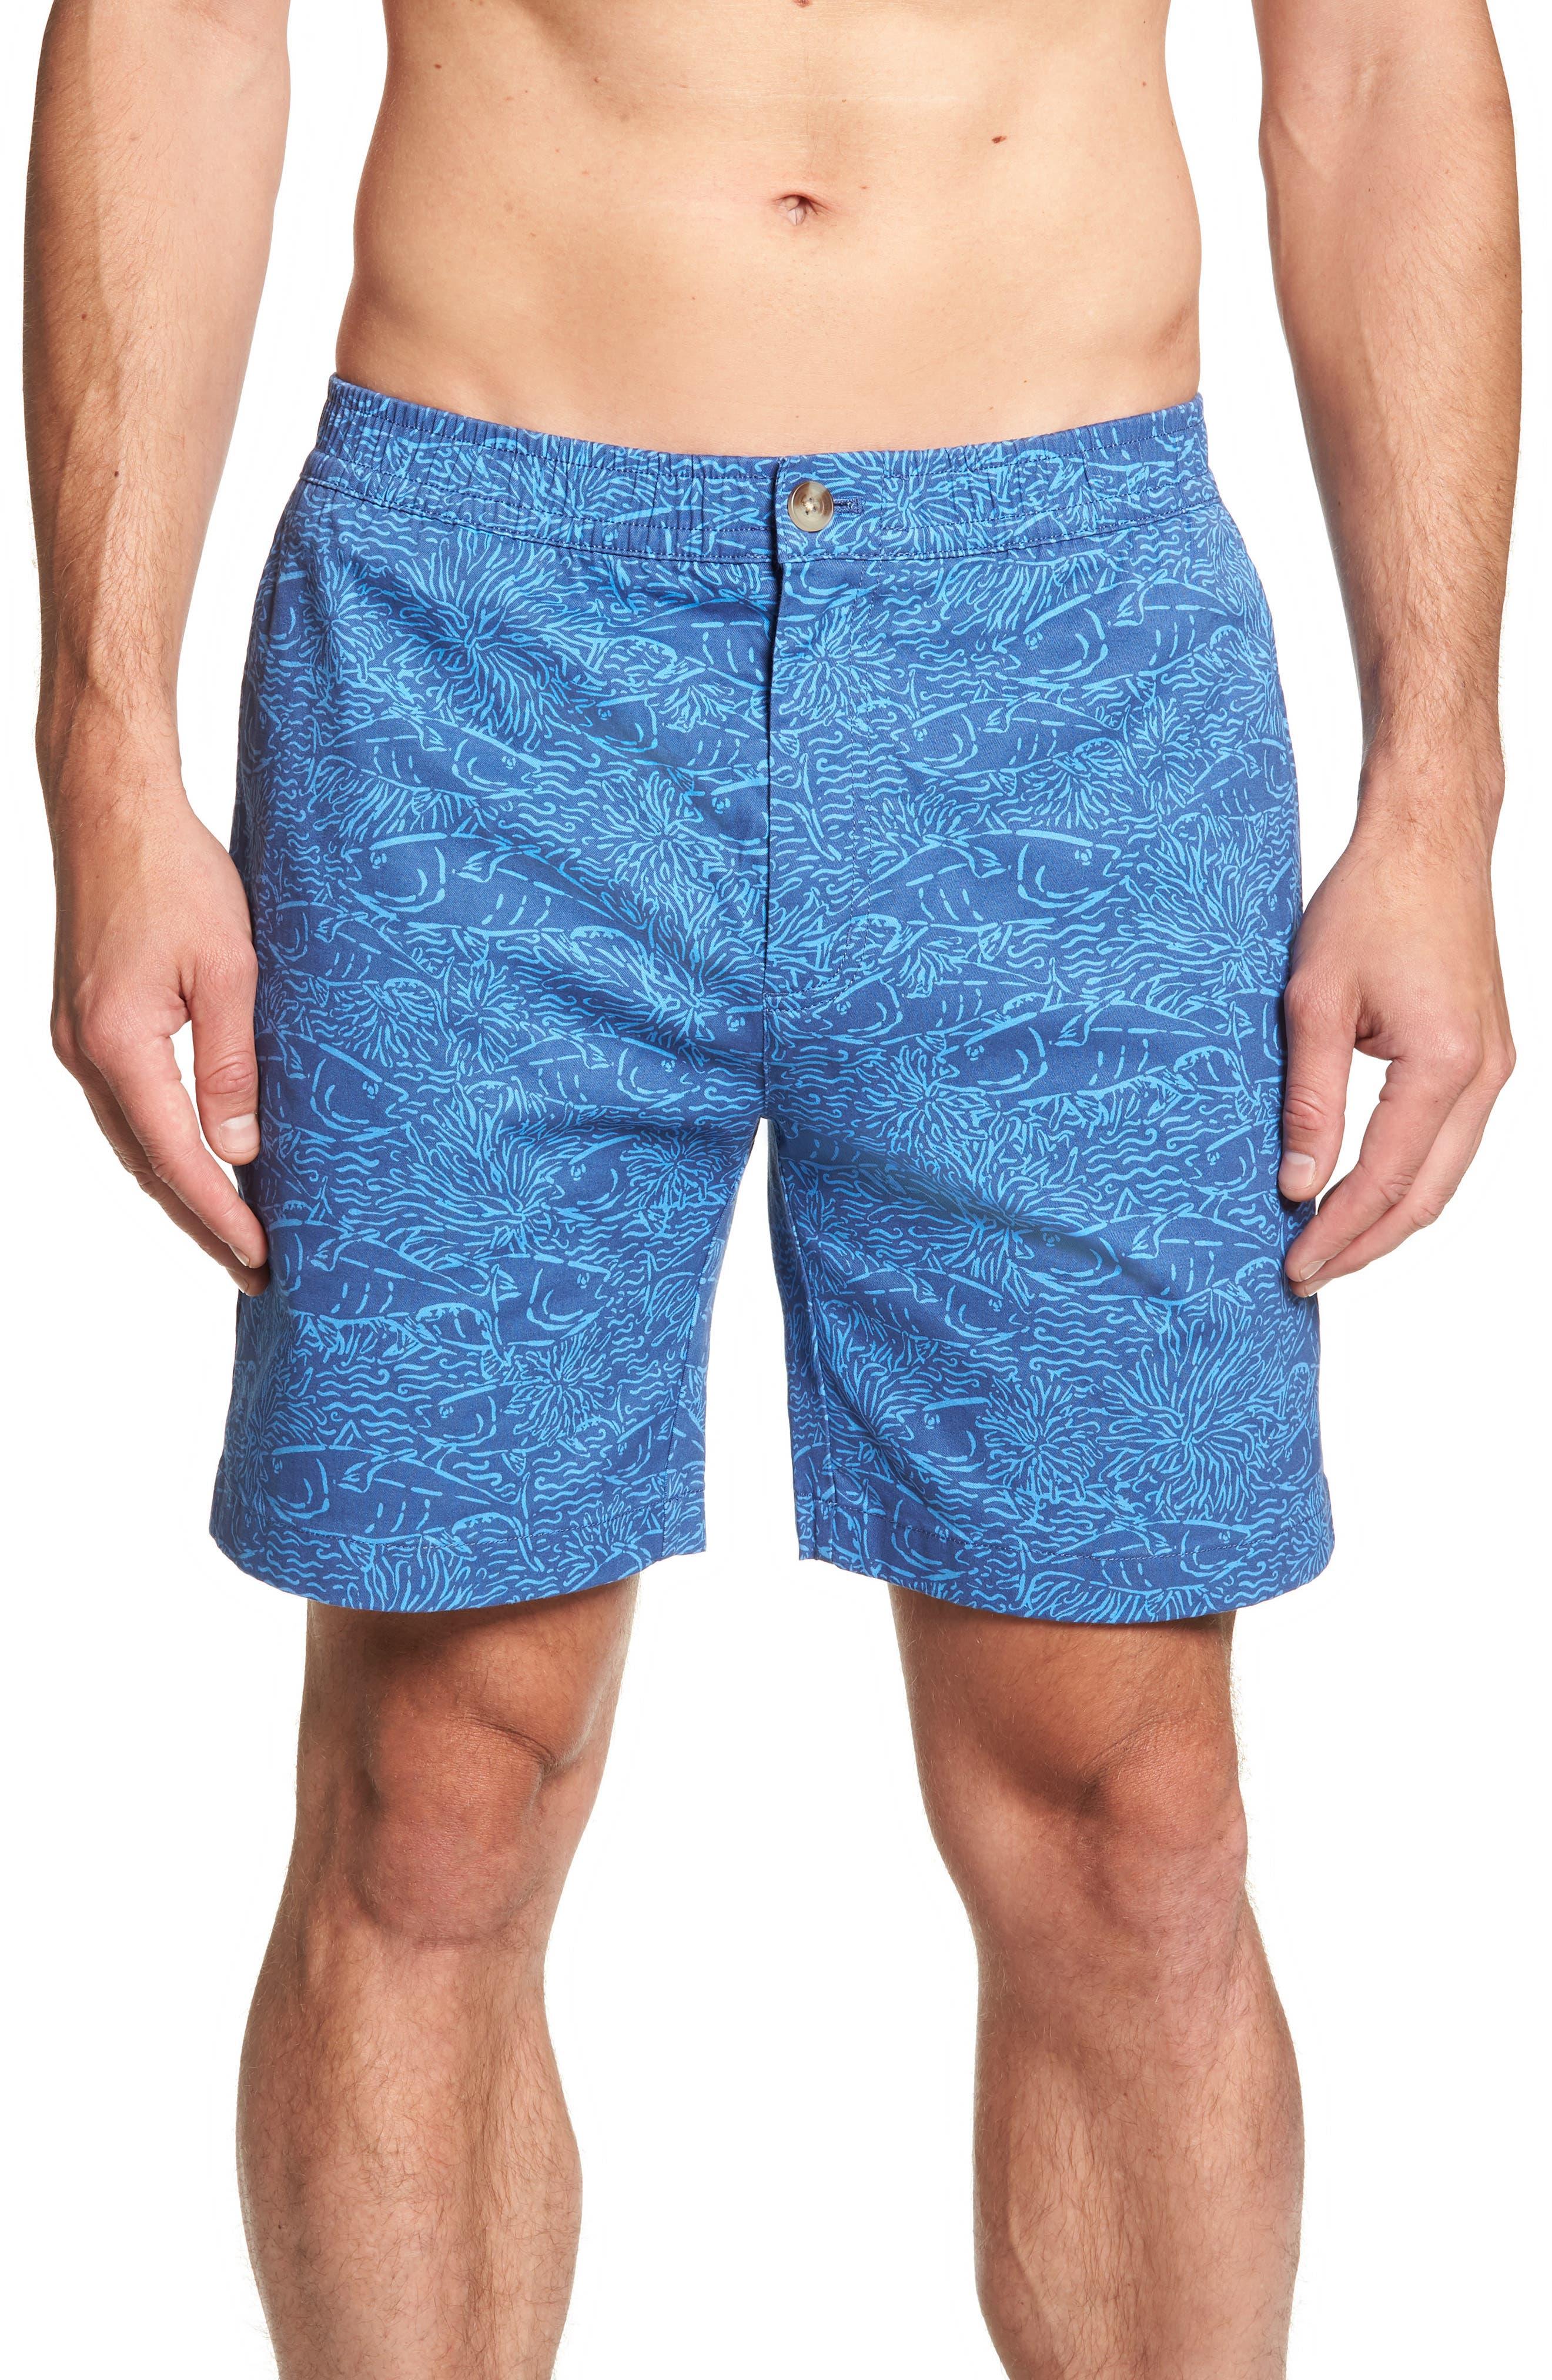 Jetty Print Stretch Cotton Shorts,                             Main thumbnail 1, color,                             461